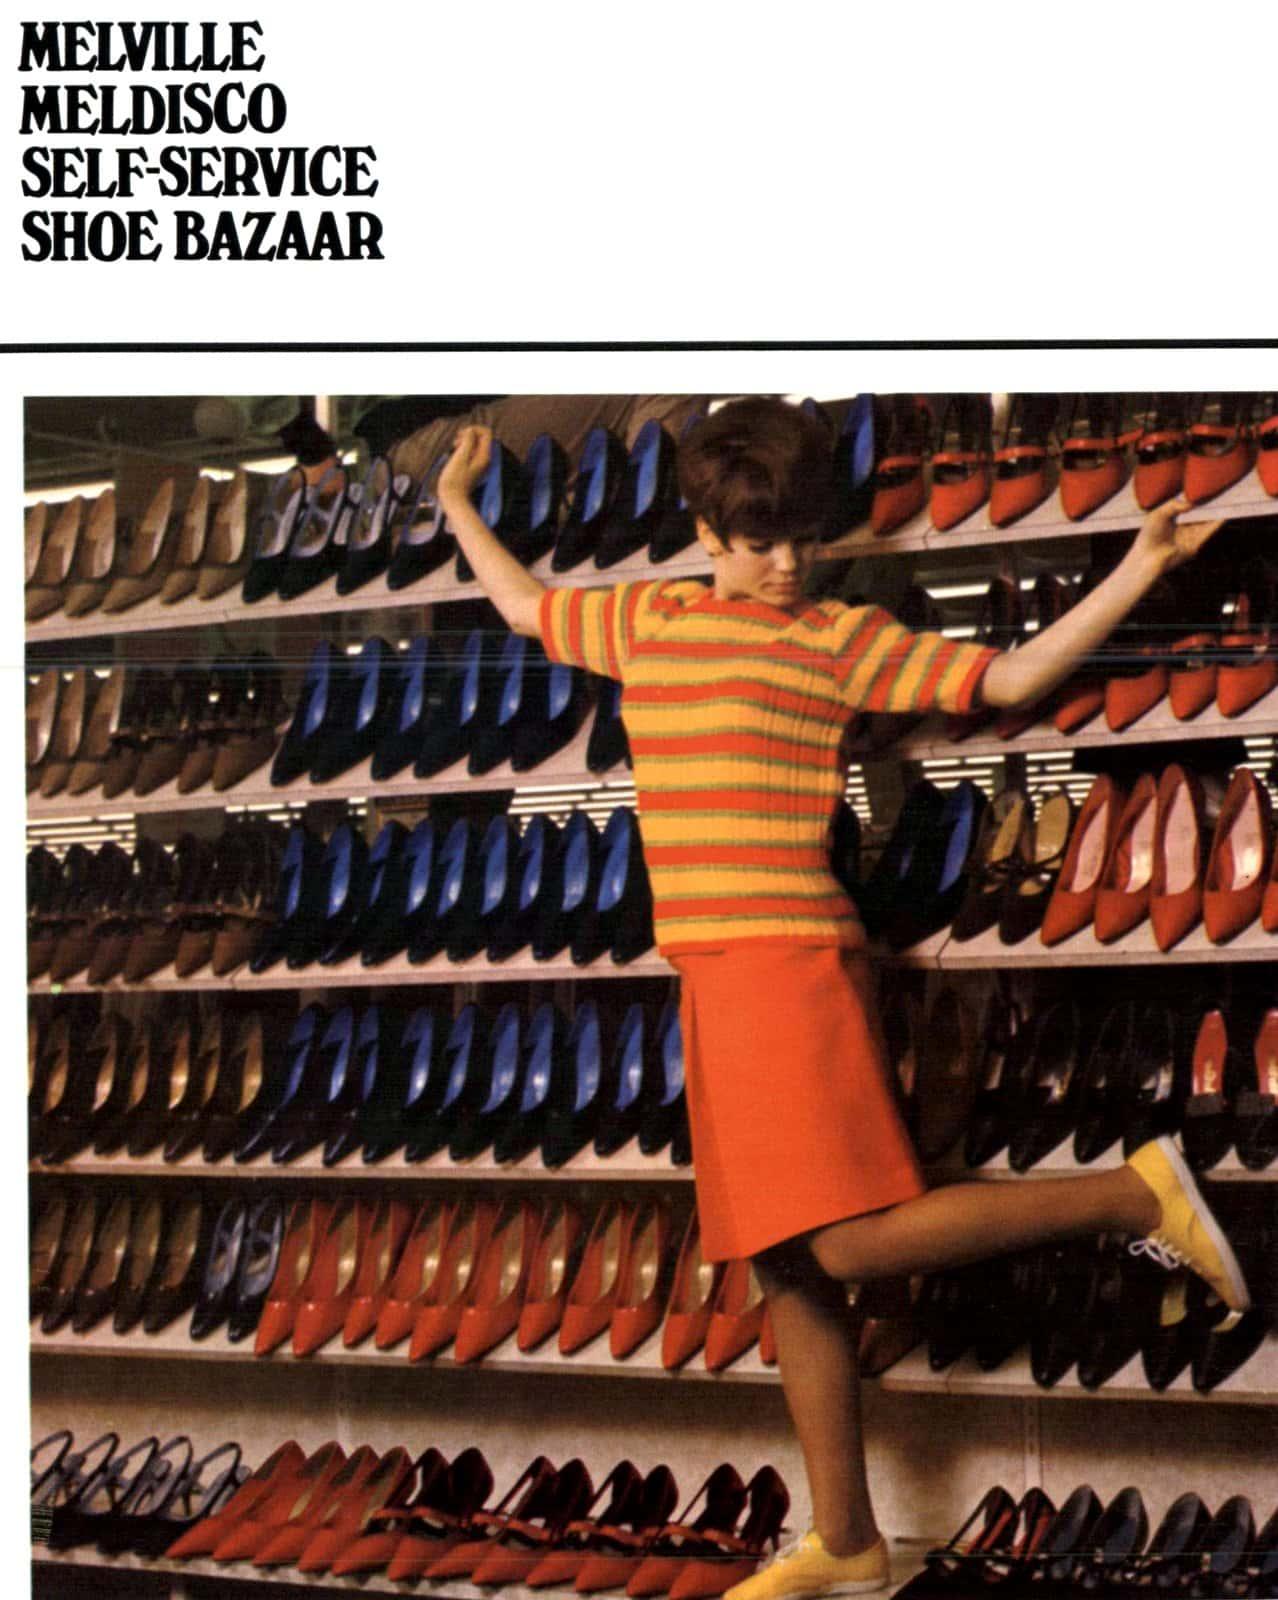 Melville - Meldisco - Self-service shoe bazaar (1966)